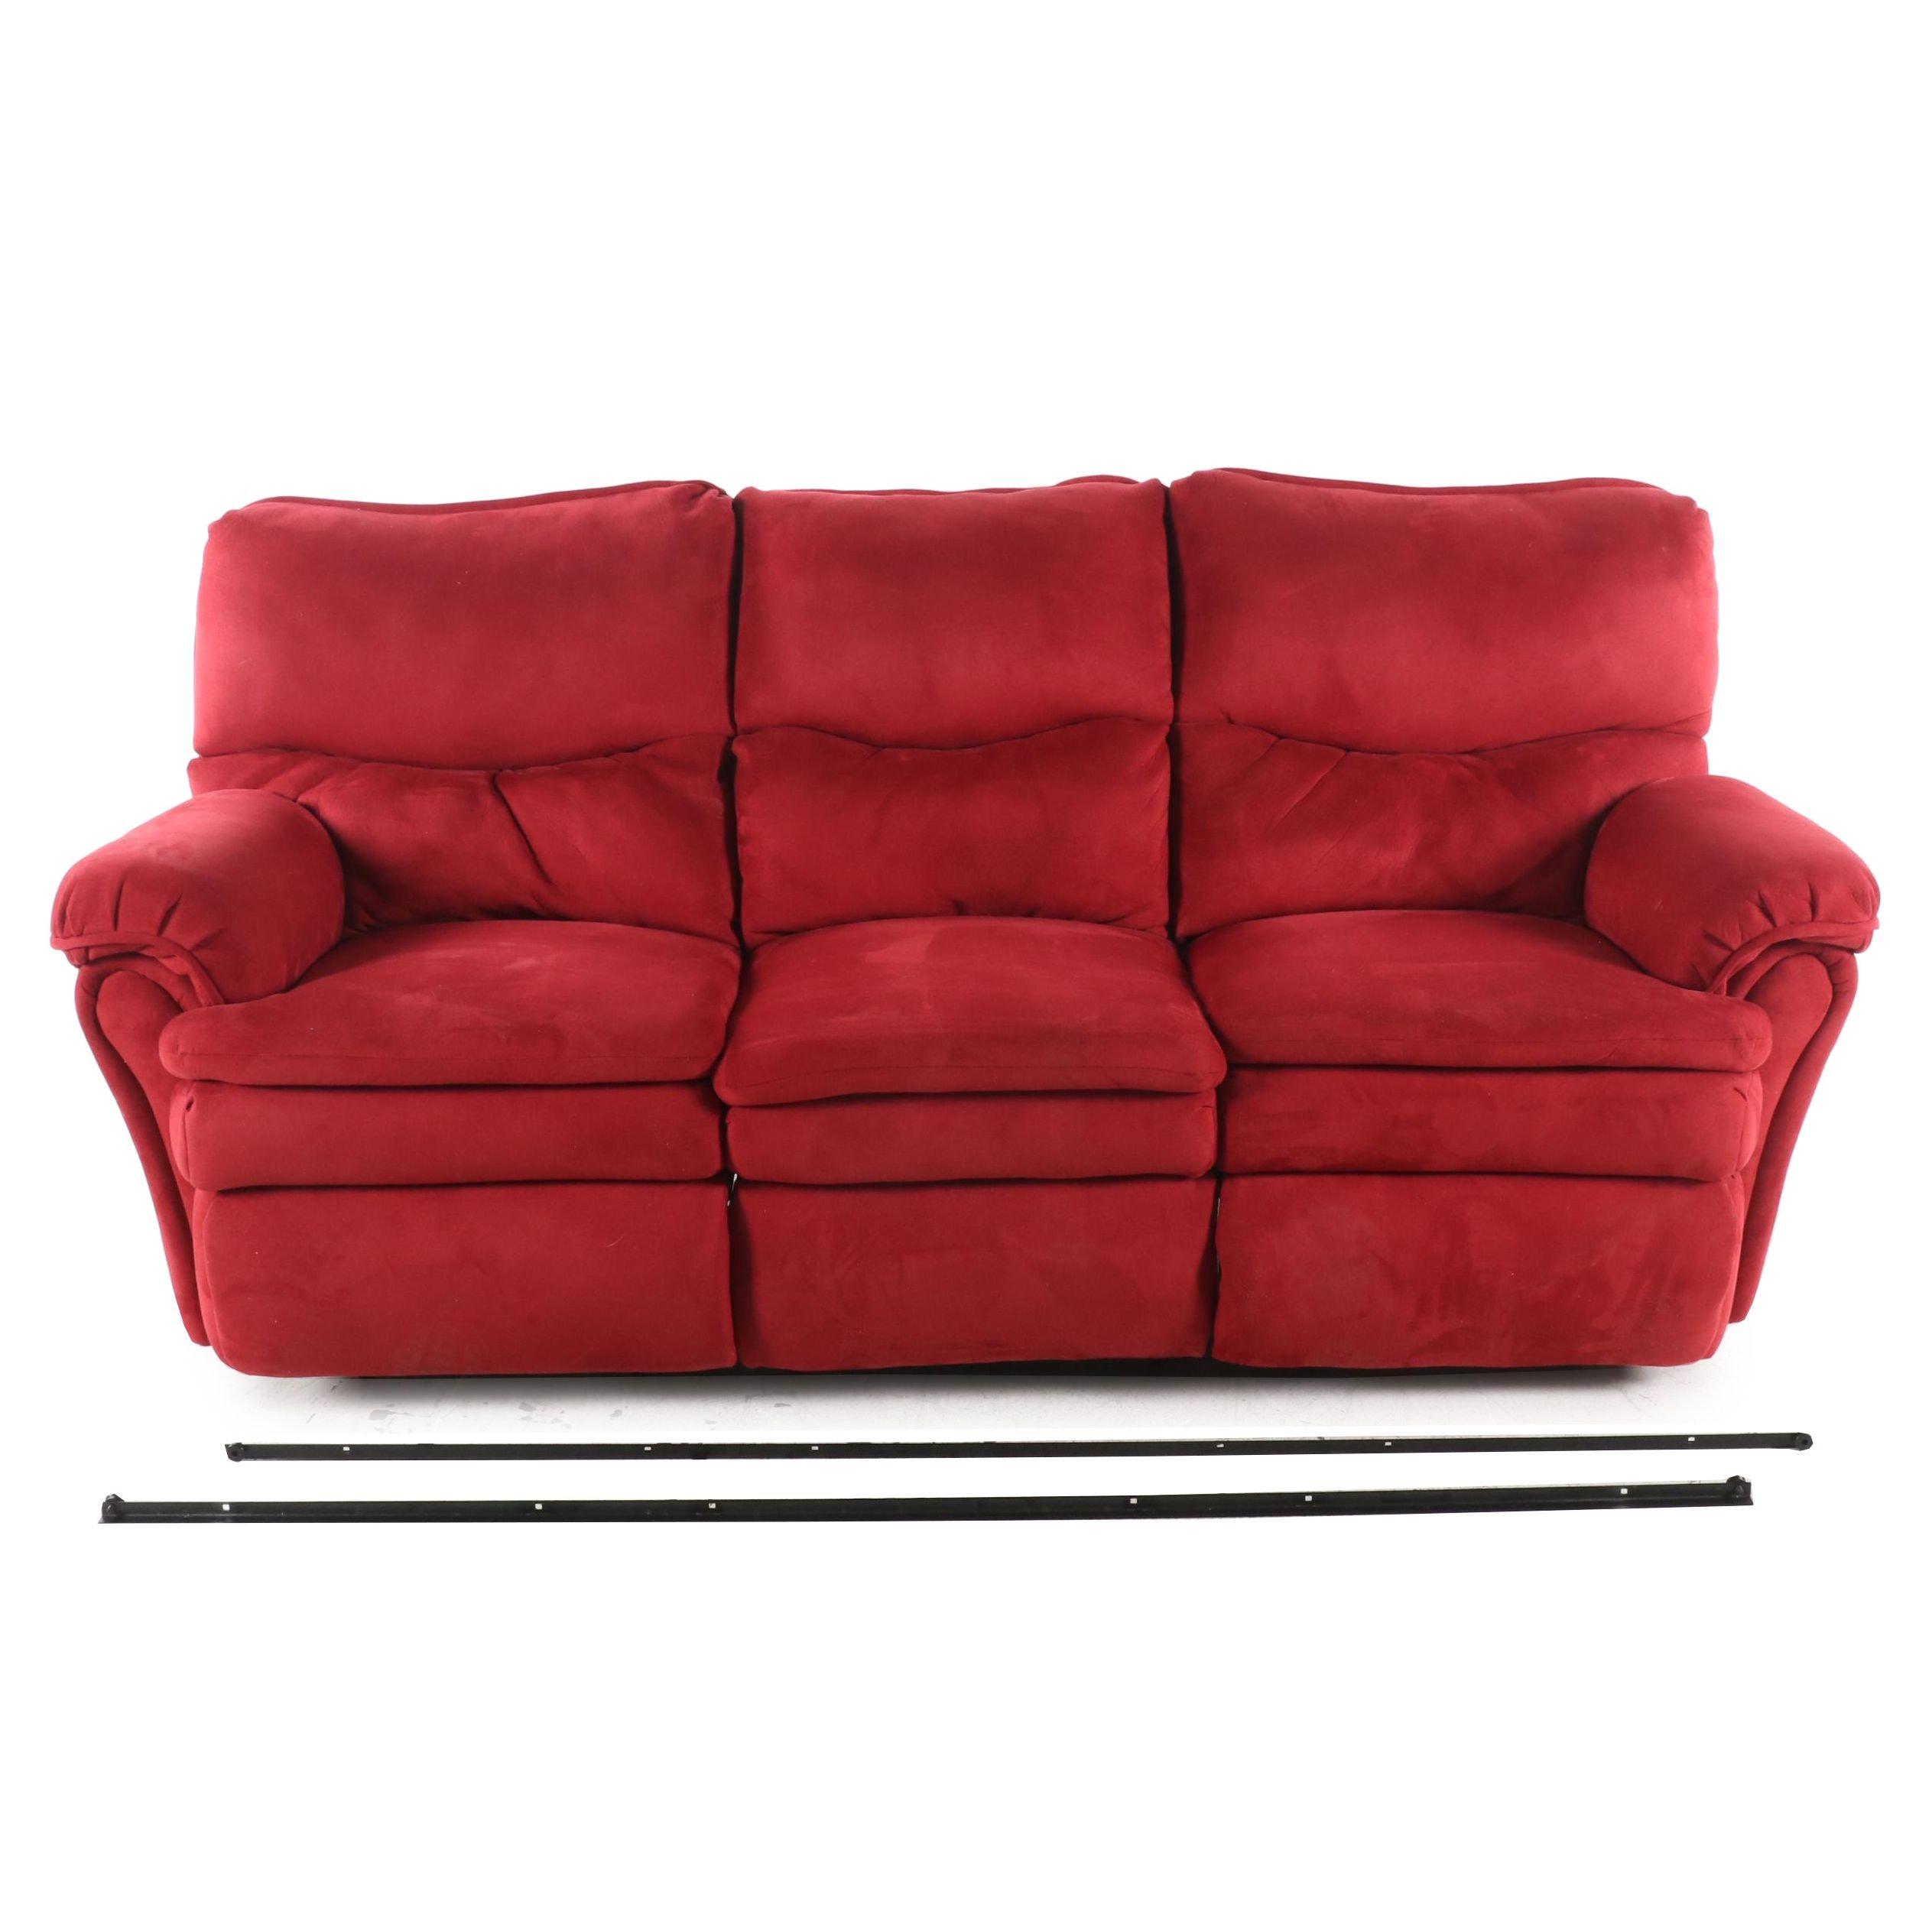 Contemporary Microfiber Three Section Recliner Sofa